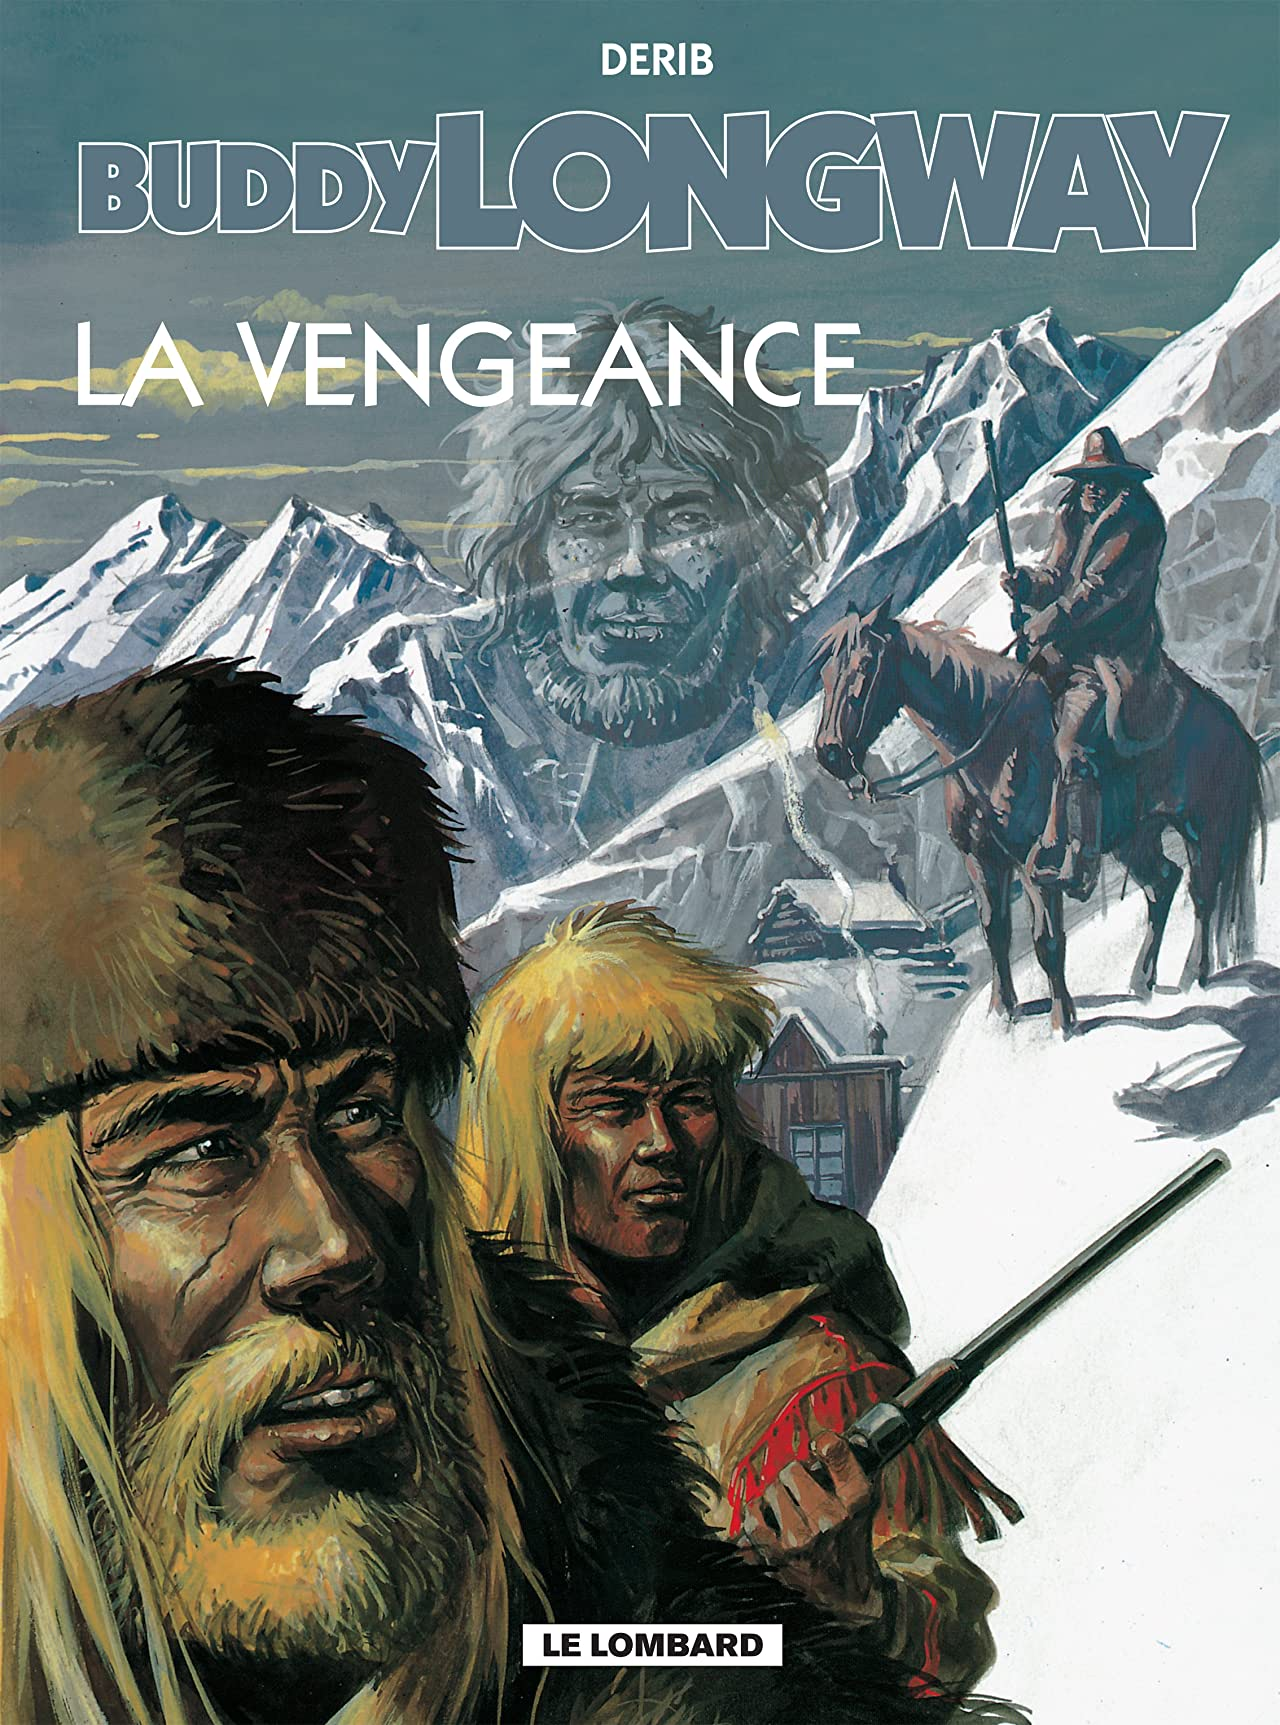 Buddy Longway Vol. 11: La Vengeance